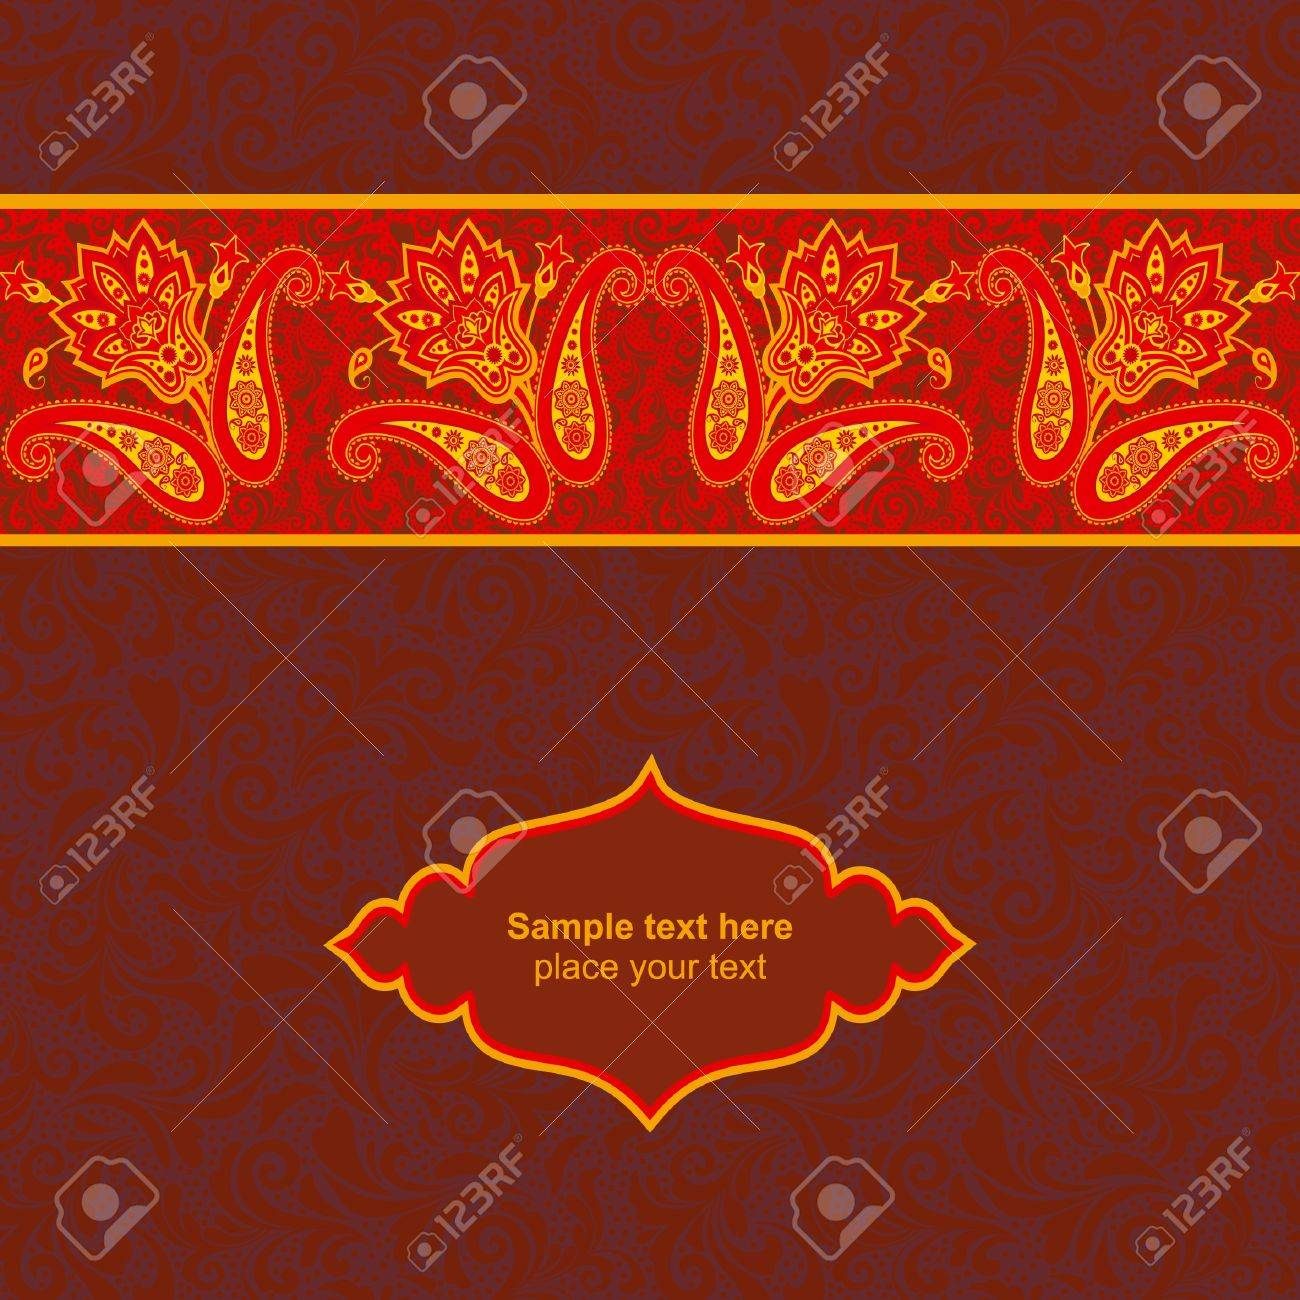 Floral ornamental card template Stock Vector - 17773690